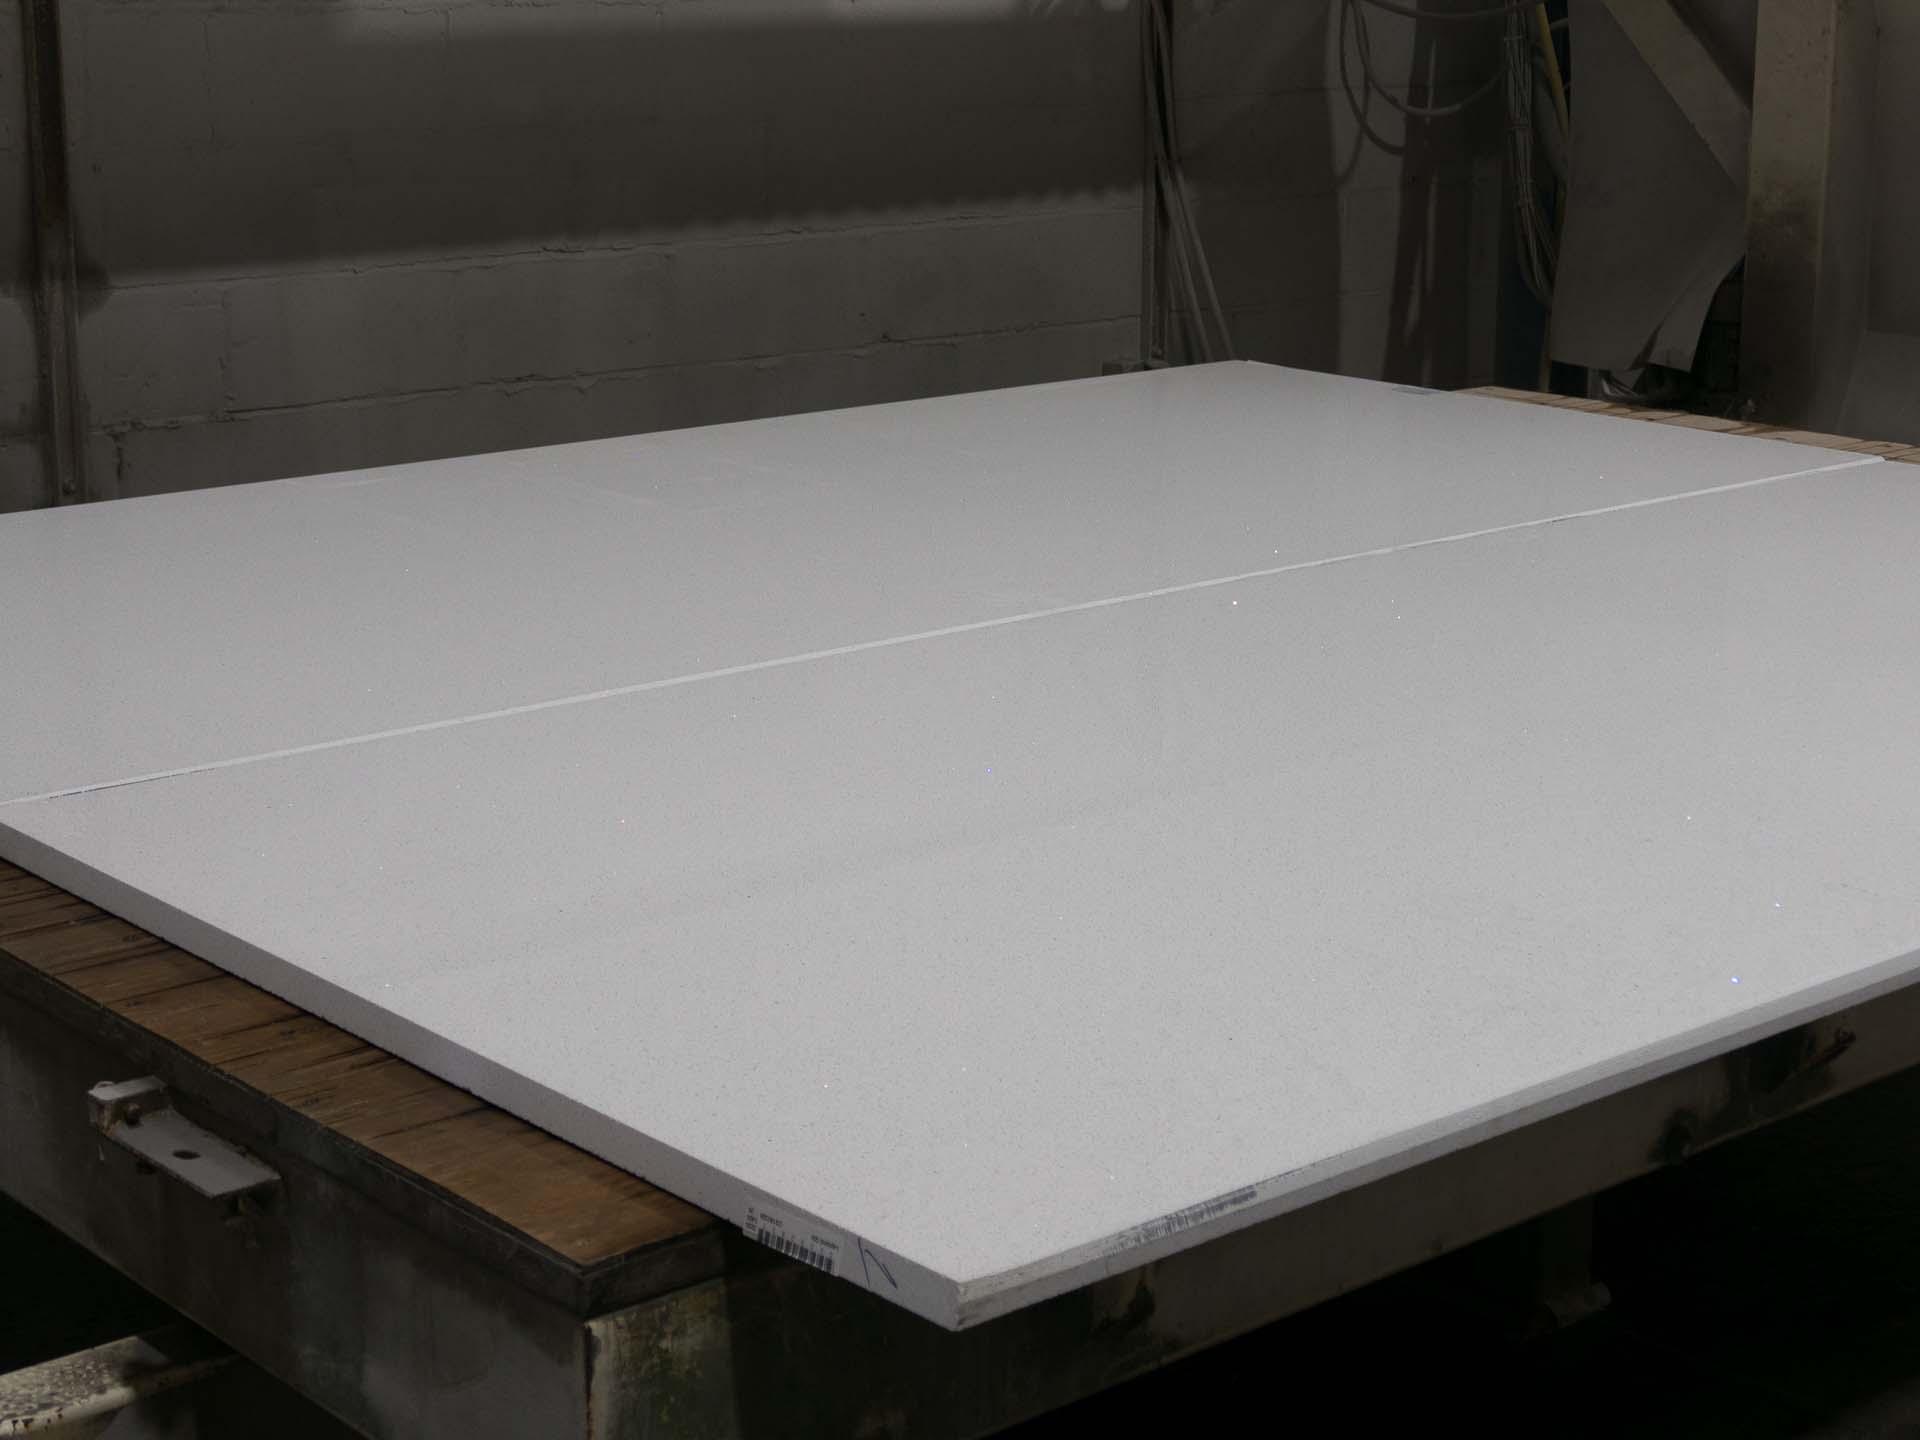 quartz-worktops-slab-variation-083916